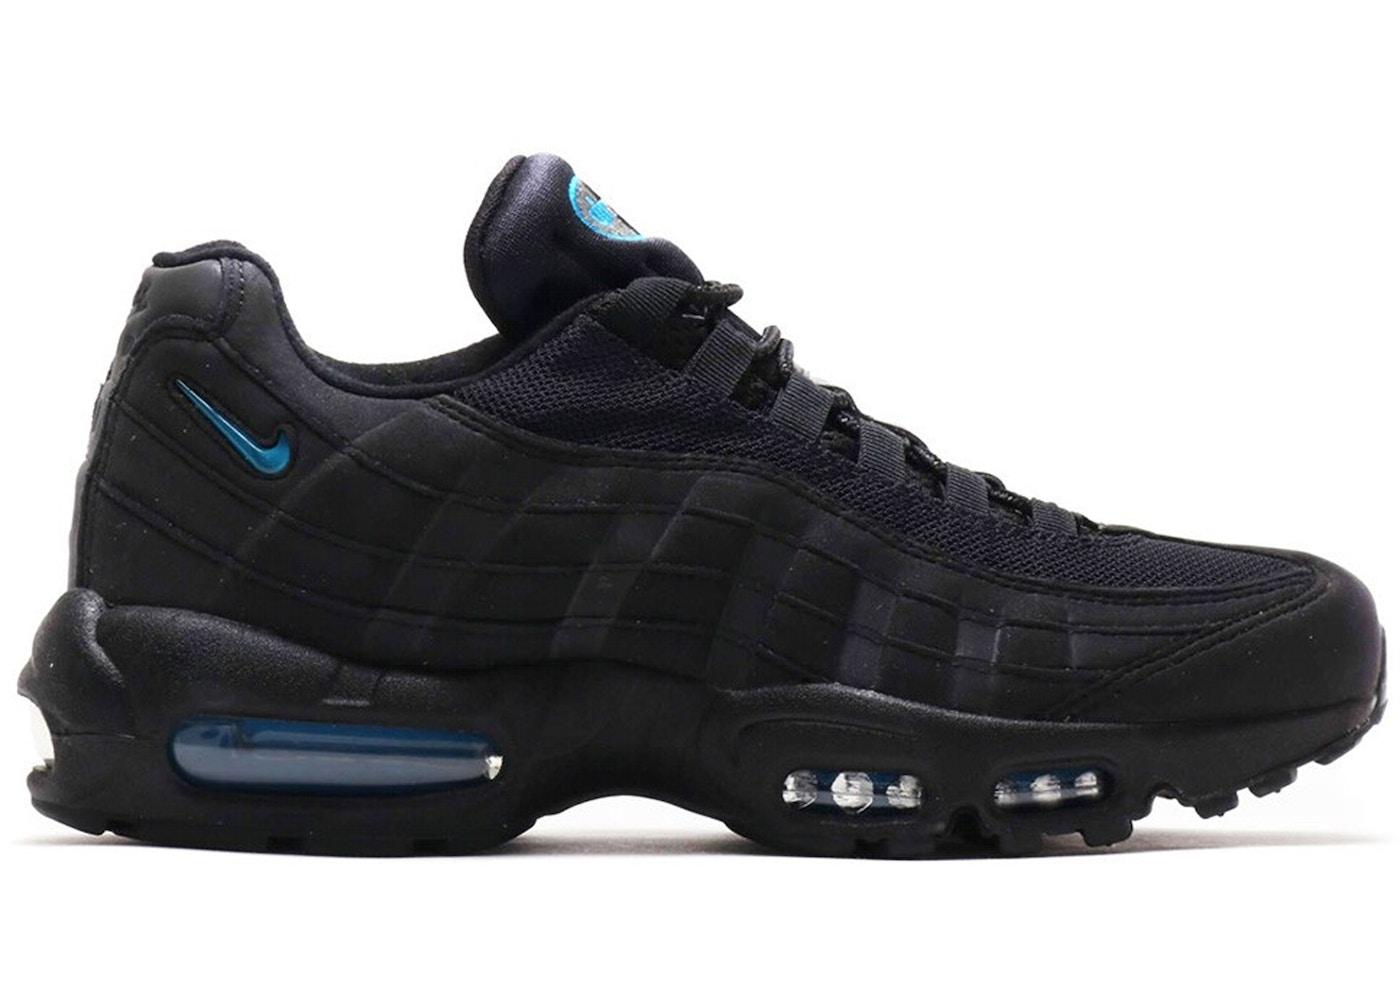 Rudyard Kipling radical a menudo  Nike Air Max 95 Black Imperial Blue (atmos Exclusive) - Sneakers